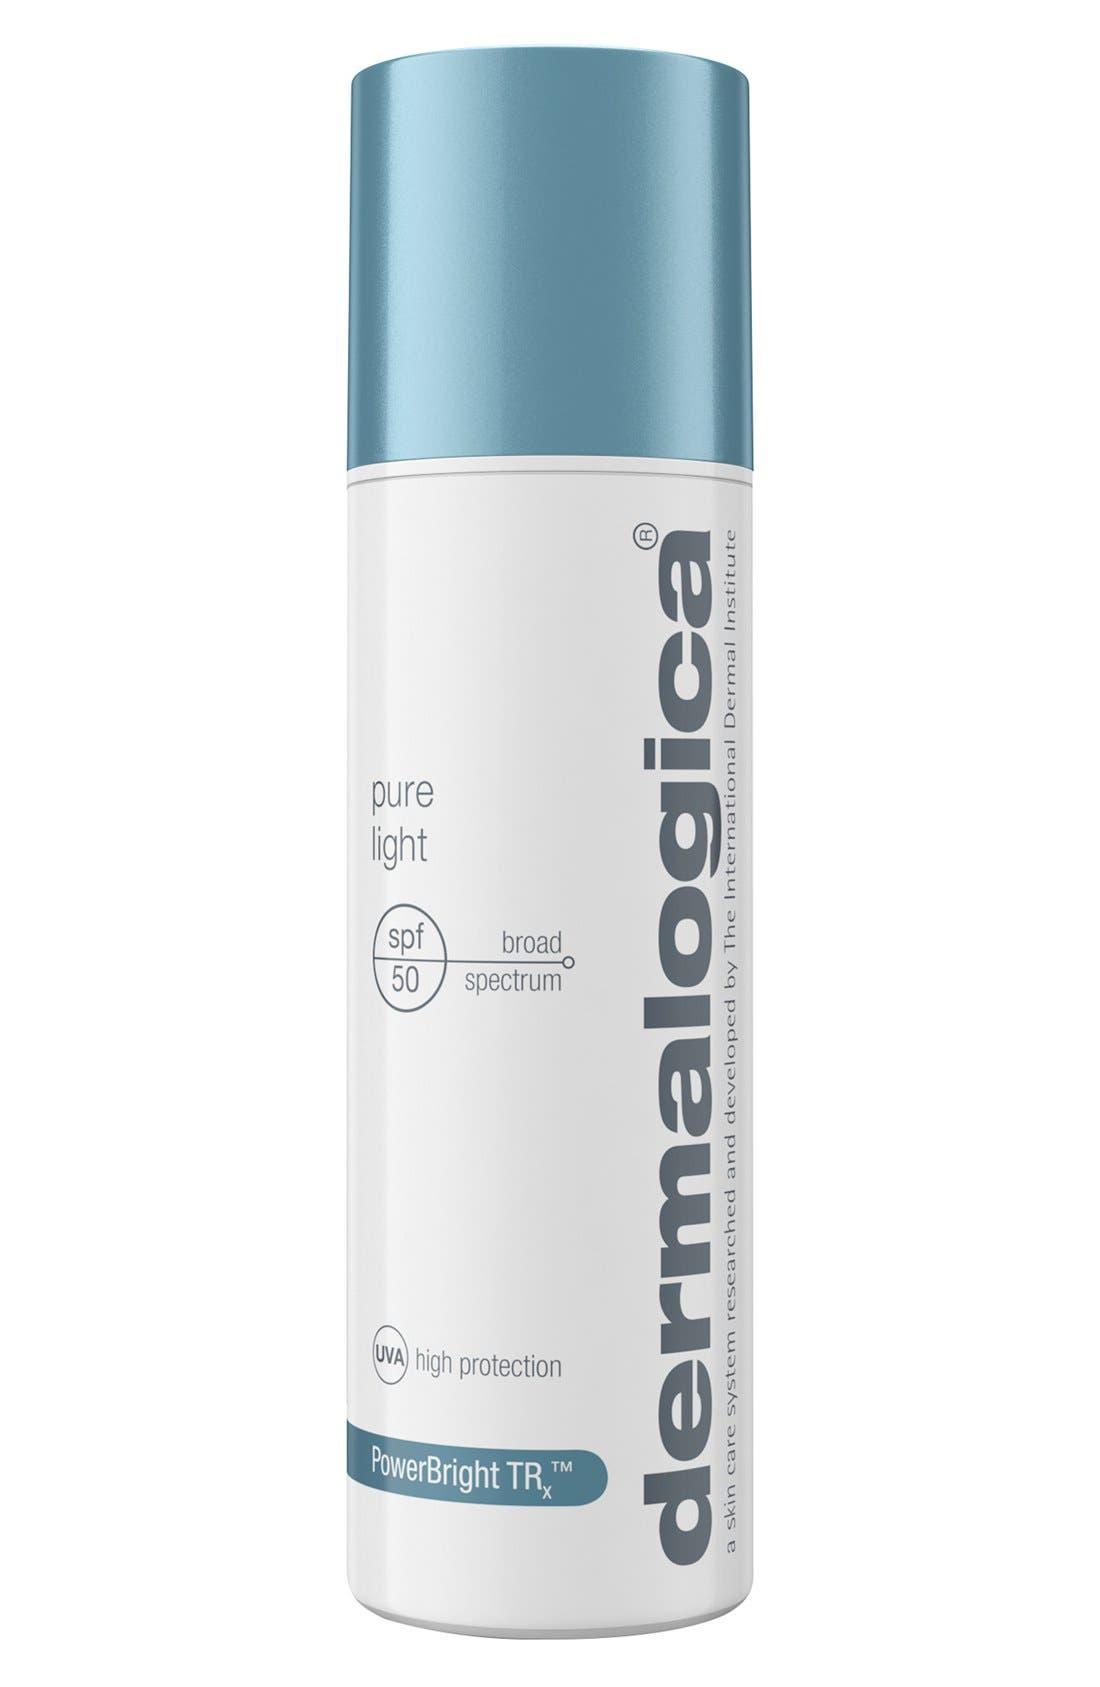 dermalogica® Pure Light SPF 50